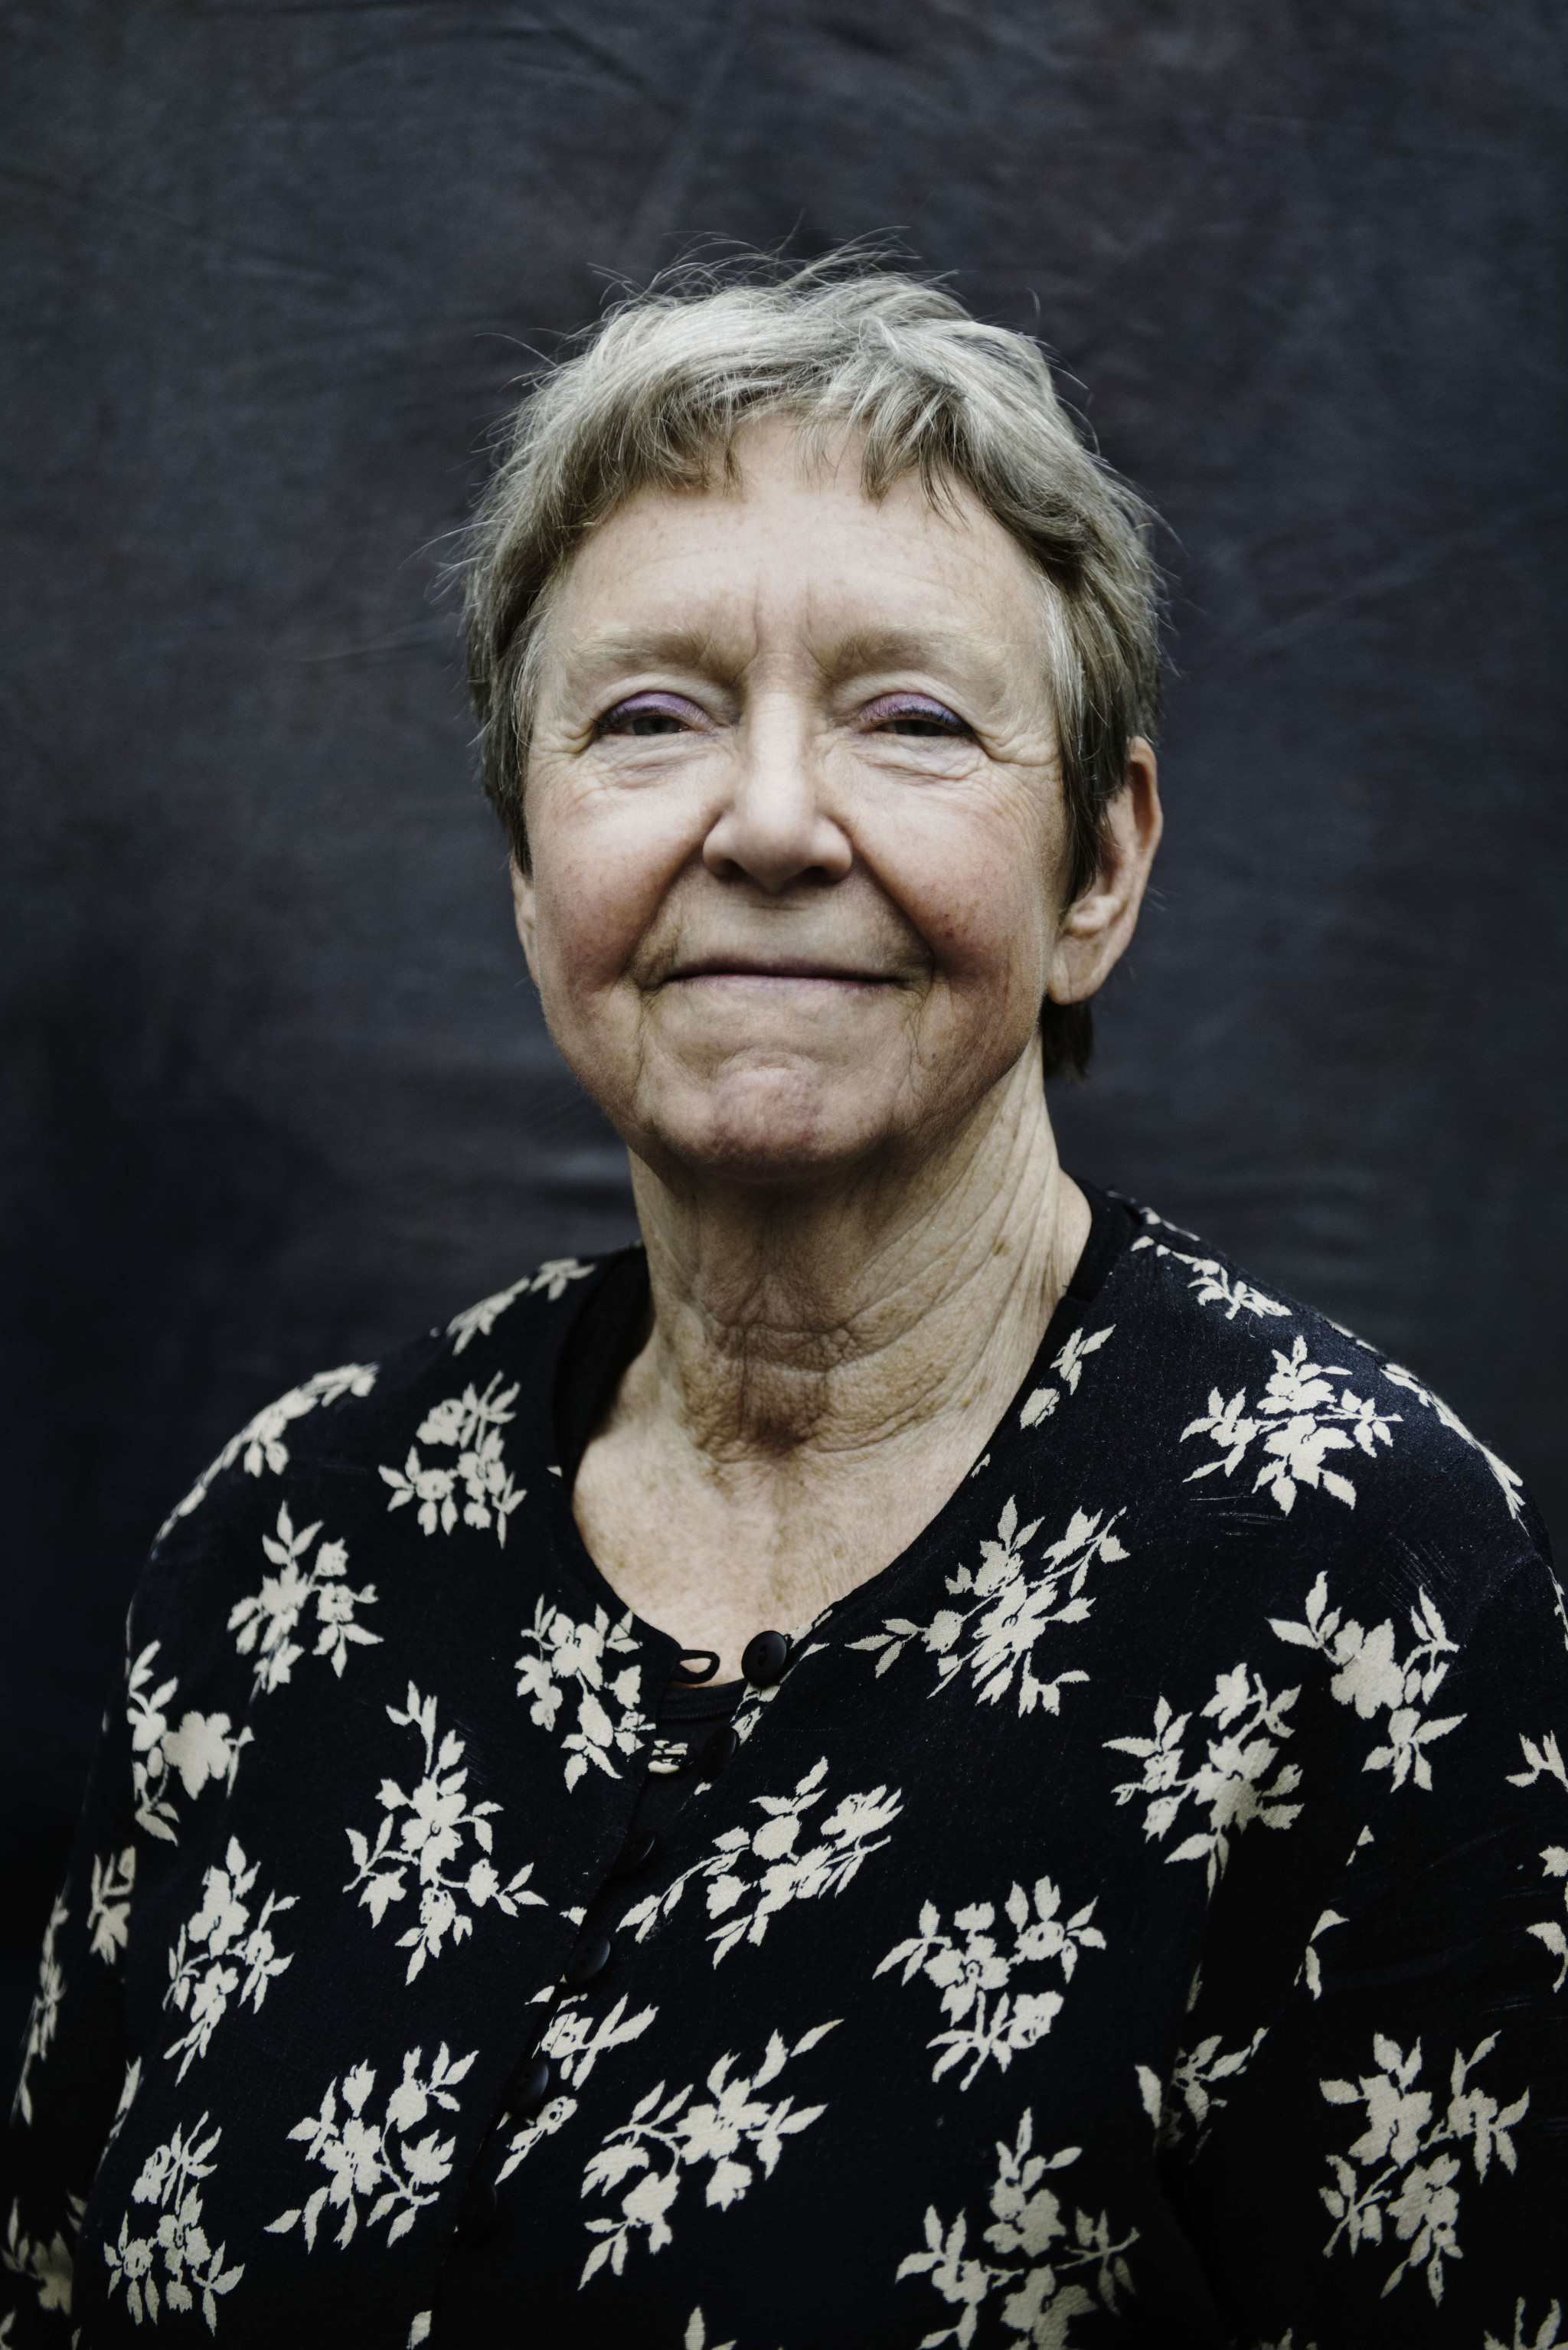 Gunnela Ståhle